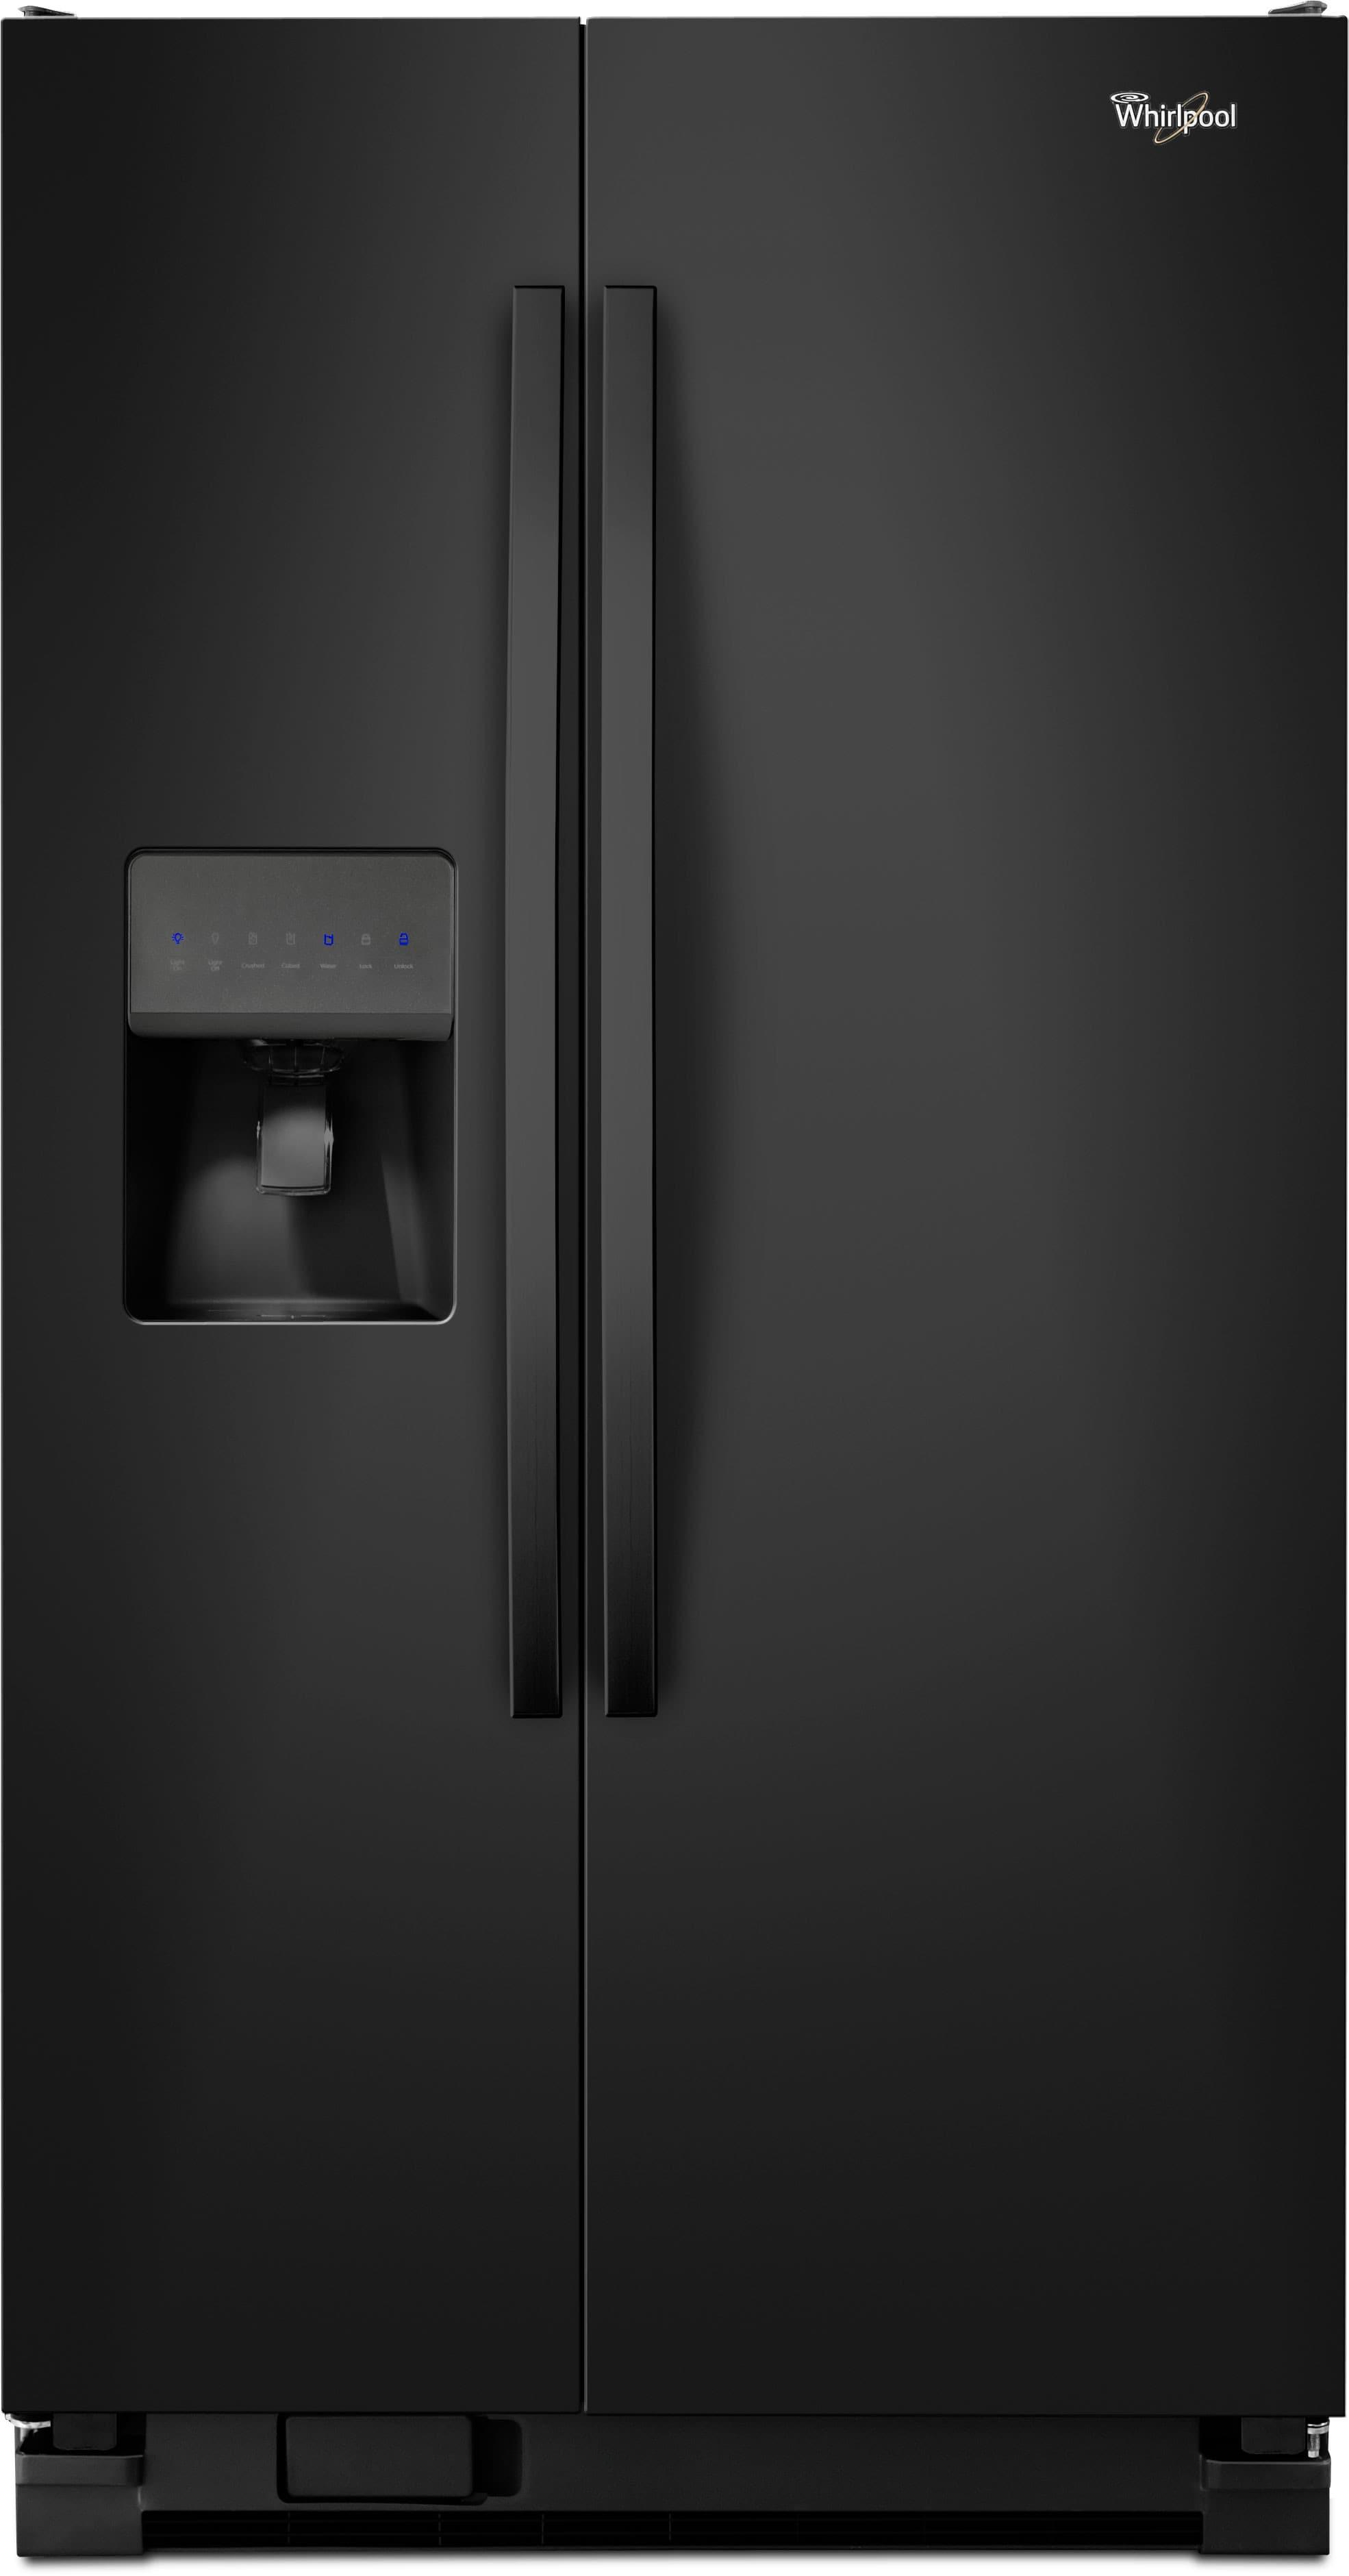 Whirlpool Wrs325fdab 36 Inch Side By Side Refrigerator